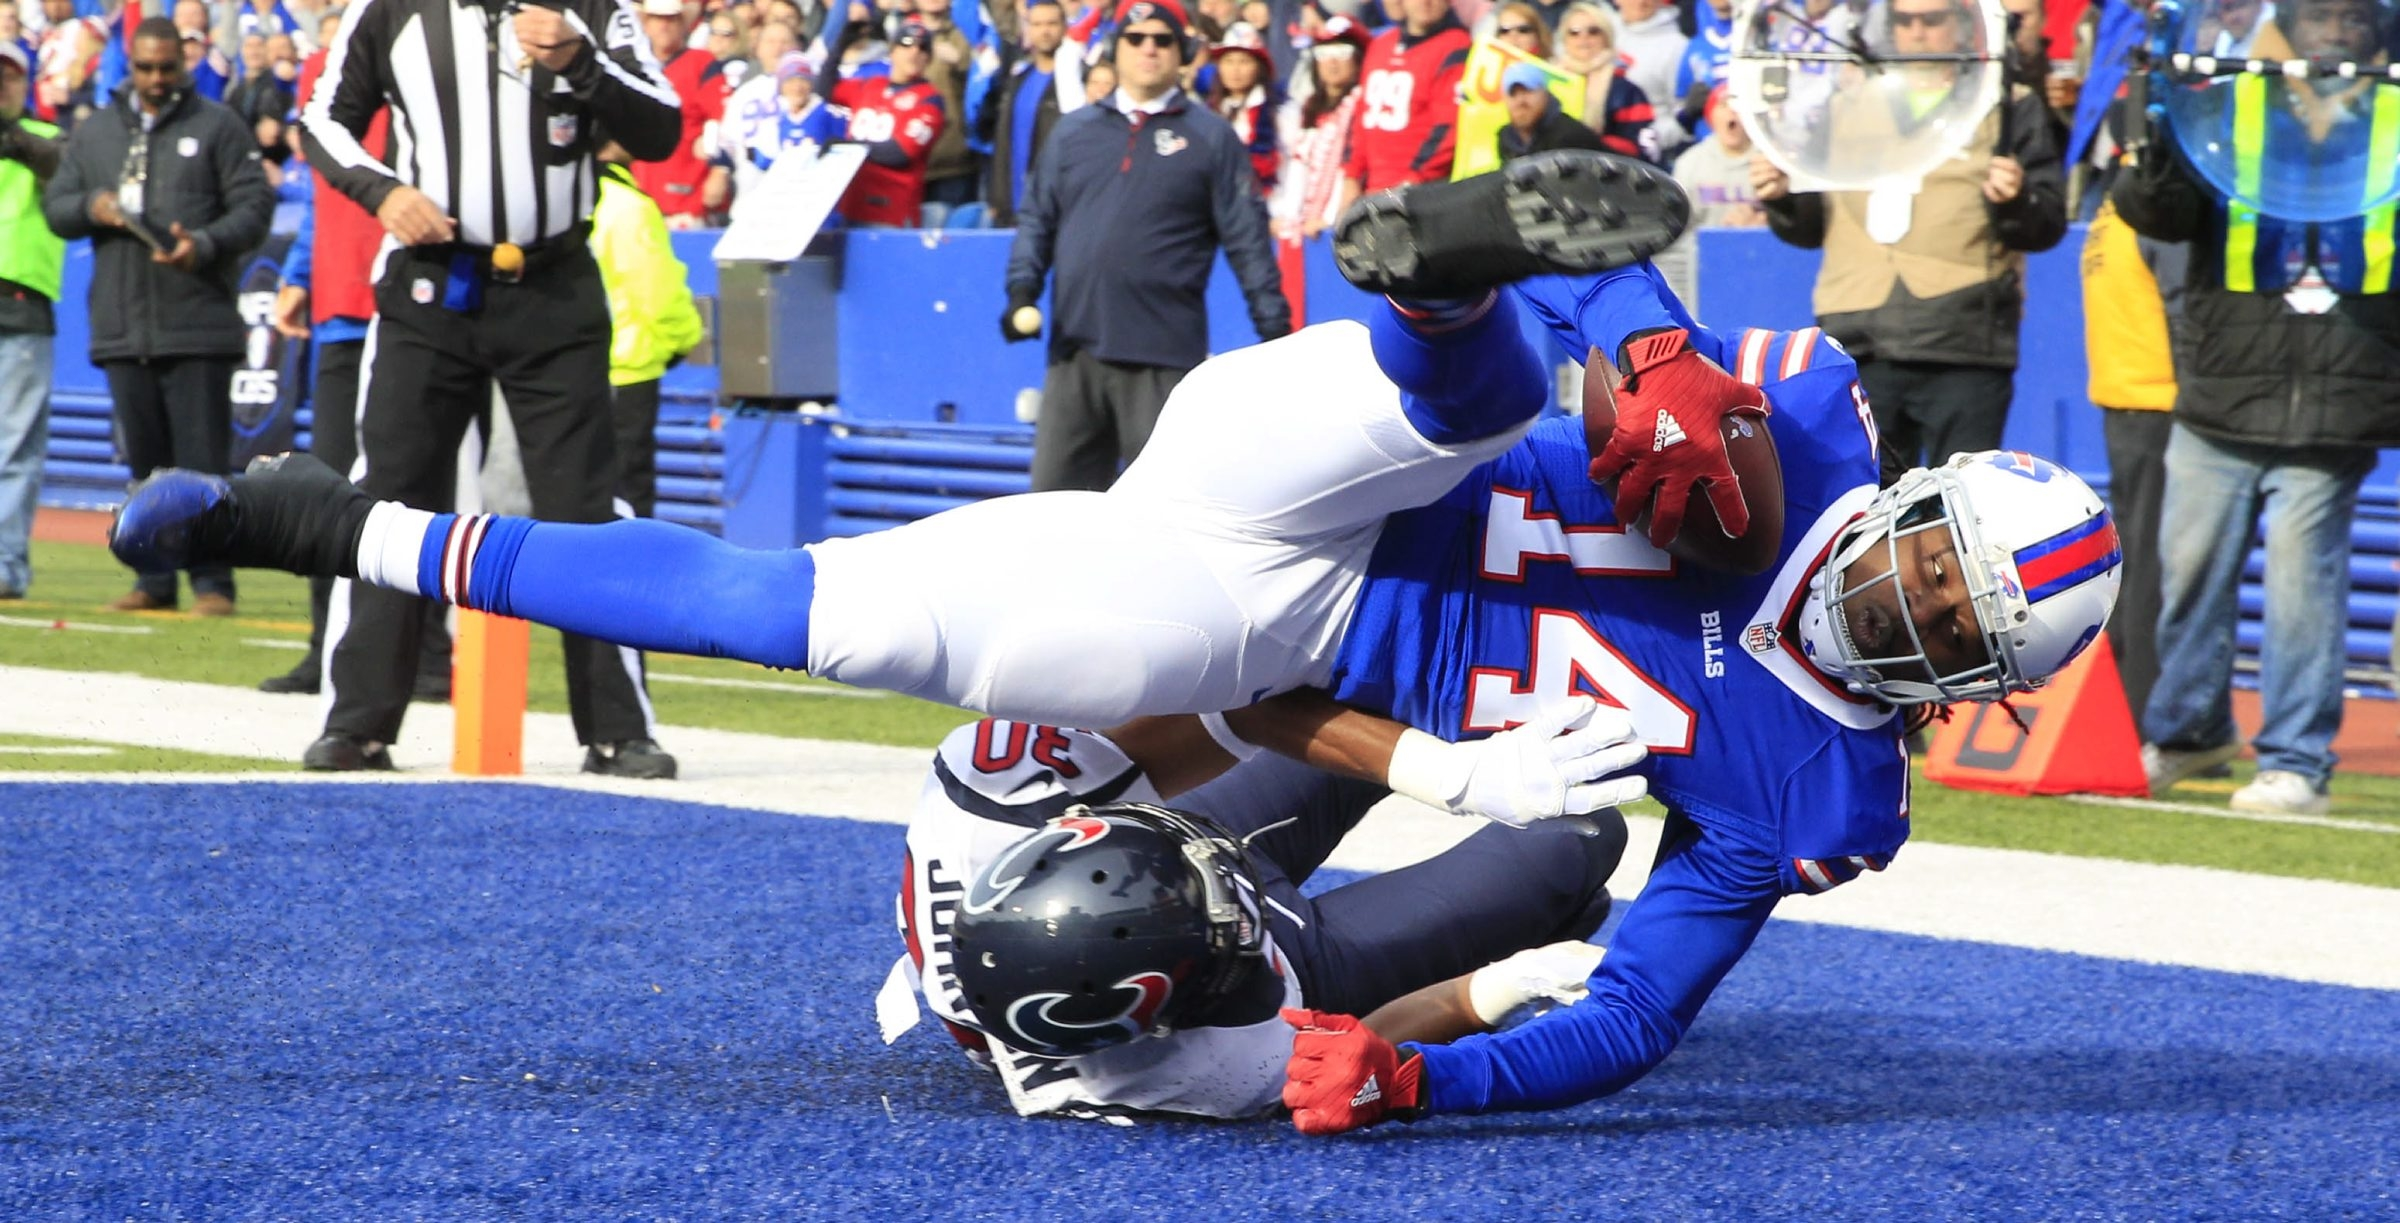 Buffalo Bills Sammy Watkins catches a touchdown against the  Houston Texans at Ralph Wilson Stadium on Sunday, Dec. 6, 2015.  (Harry Scull Jr./Buffalo News)